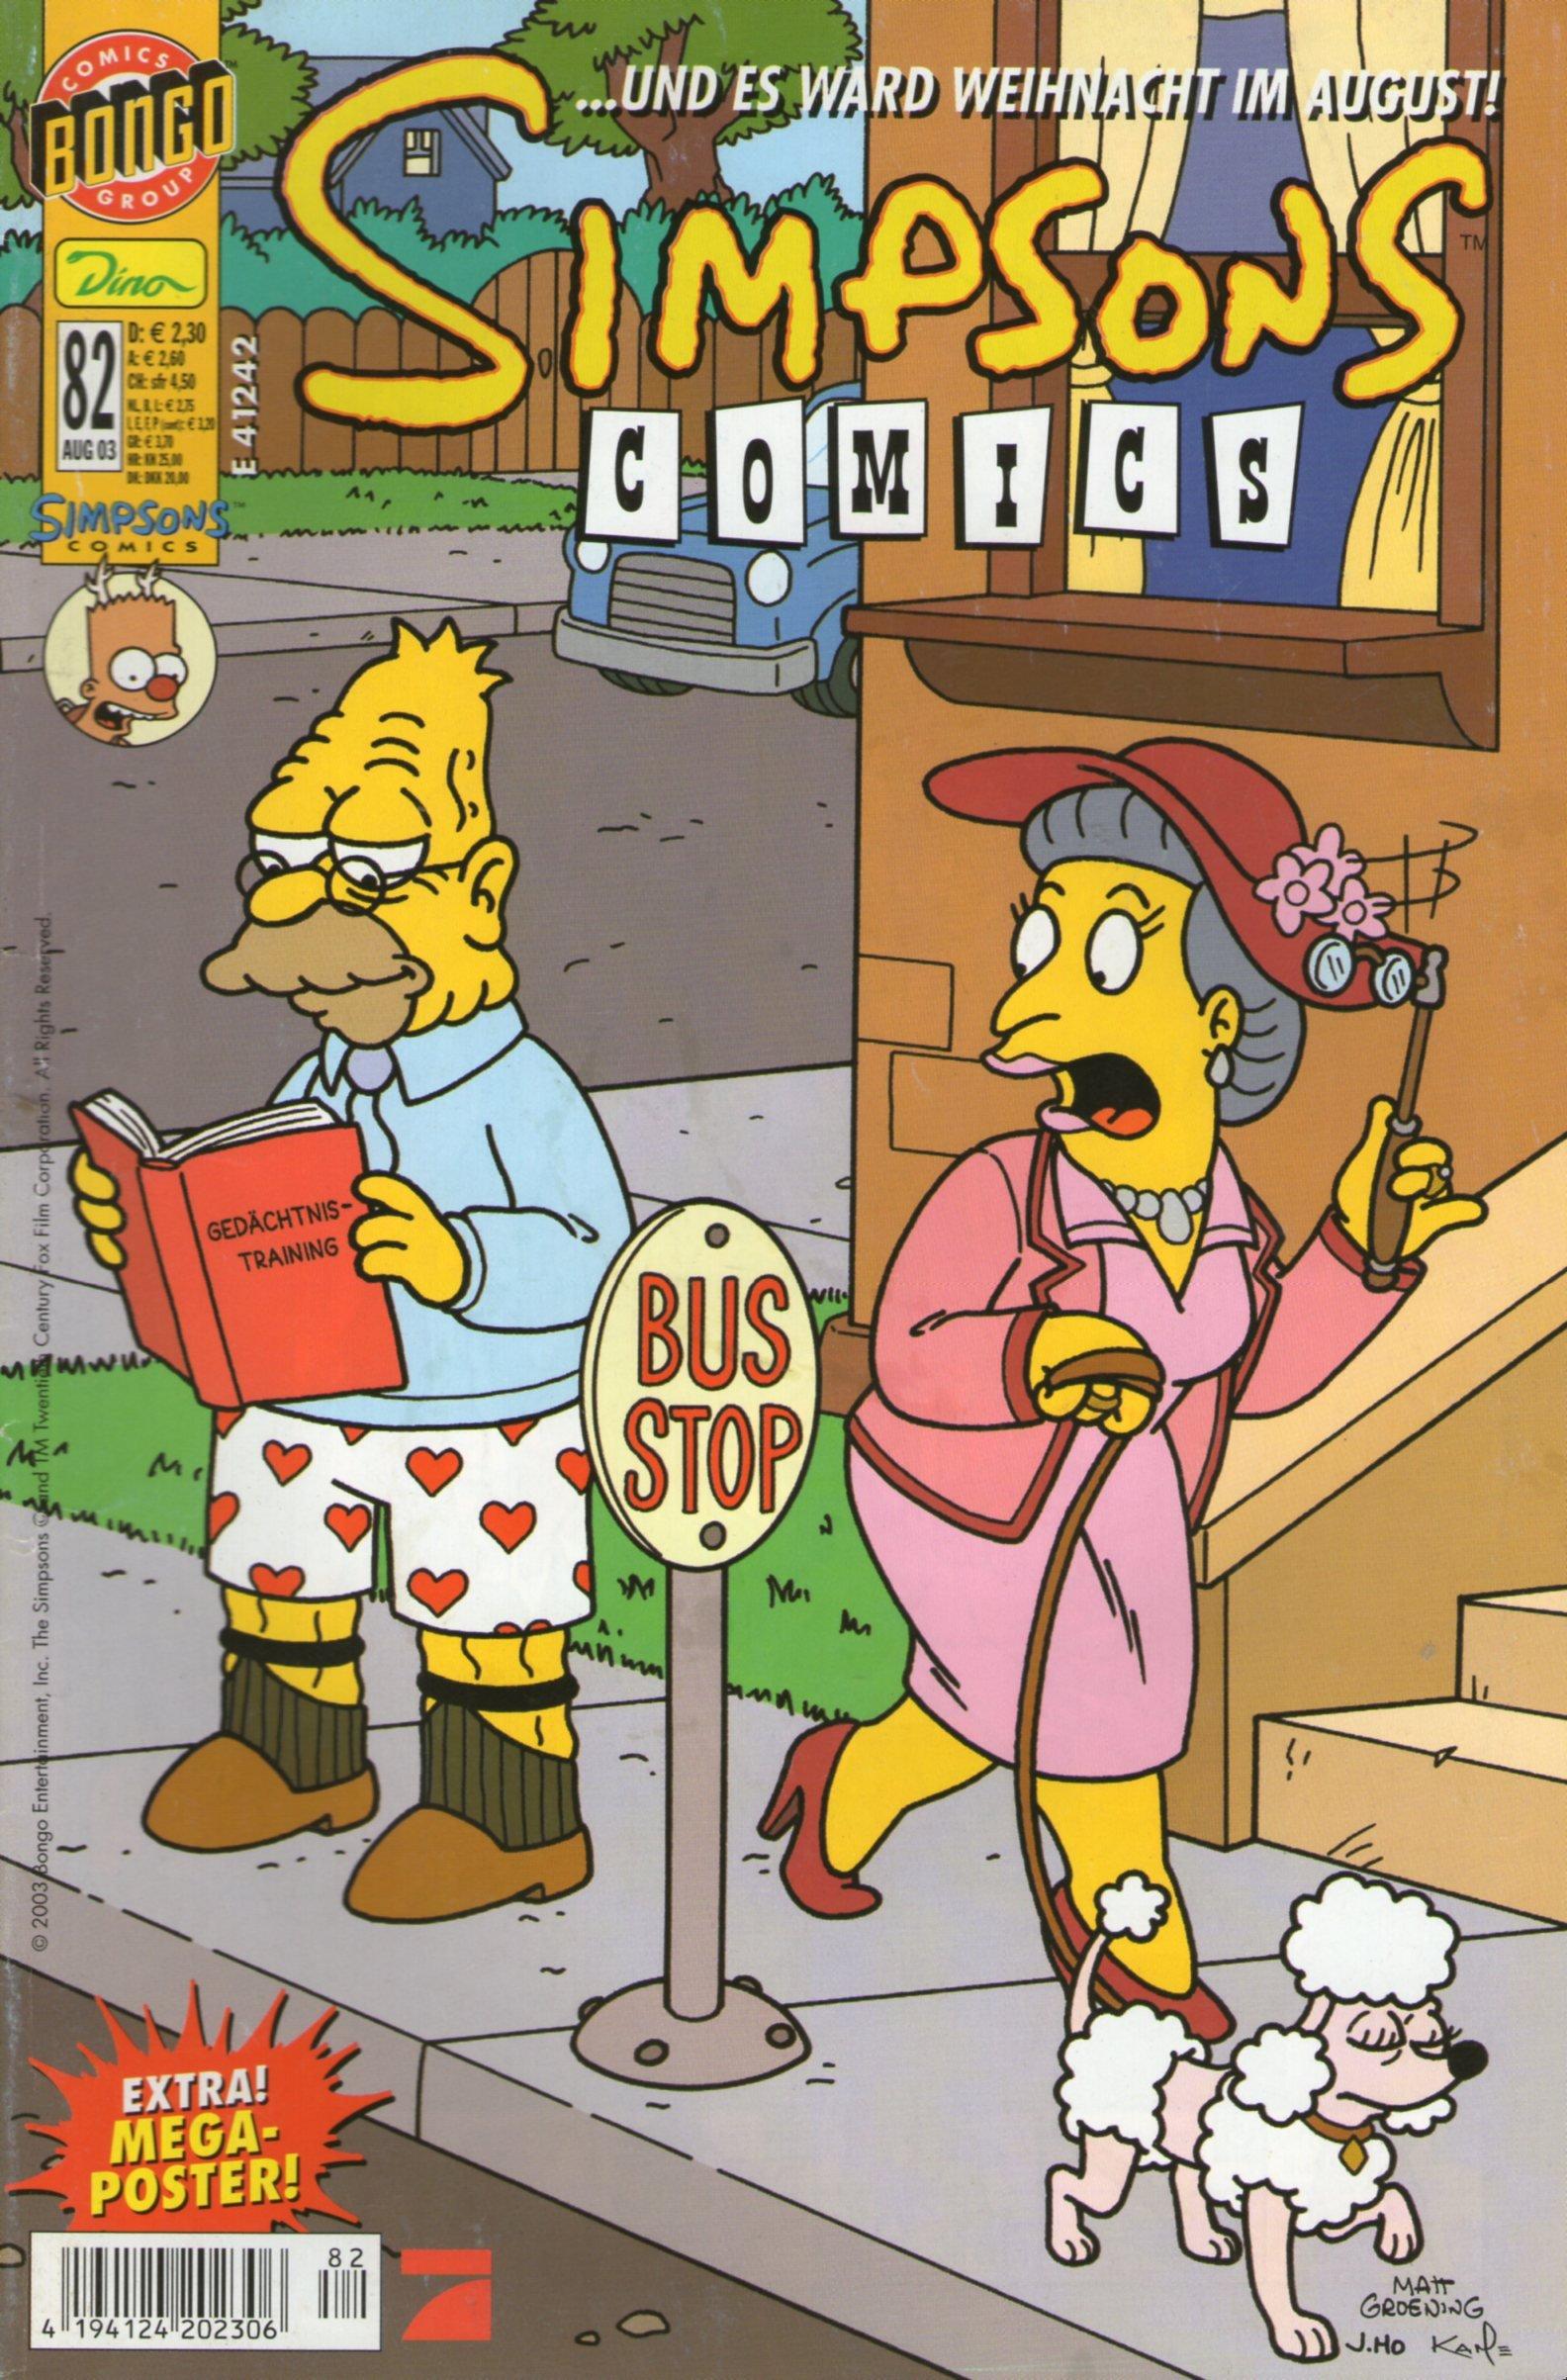 SIMPSONS Comics #82 - Exclusiver Comic mit Poster Panini 2003 (Simpsons)